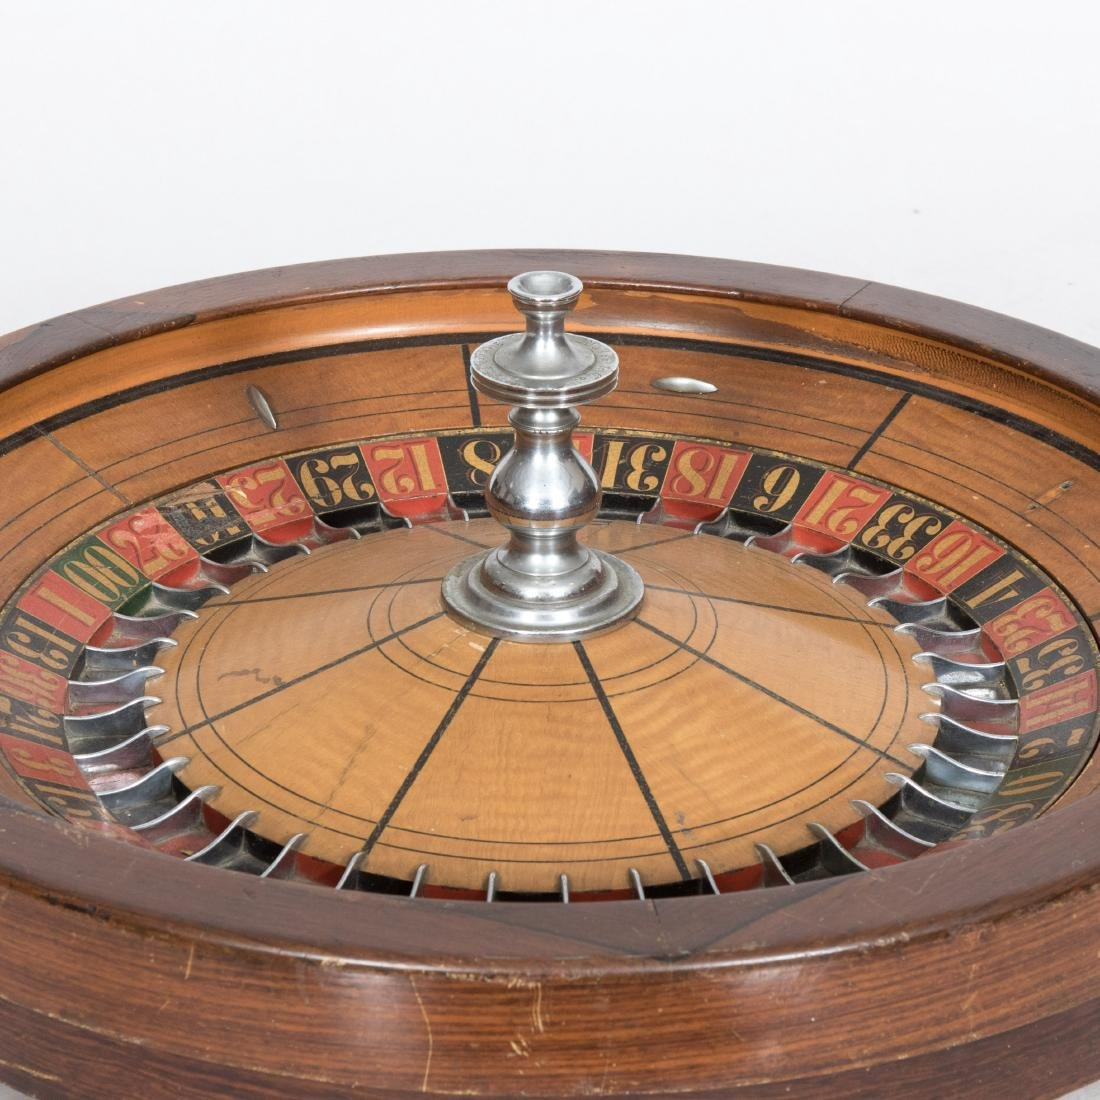 Large Roulette Wheel - 2